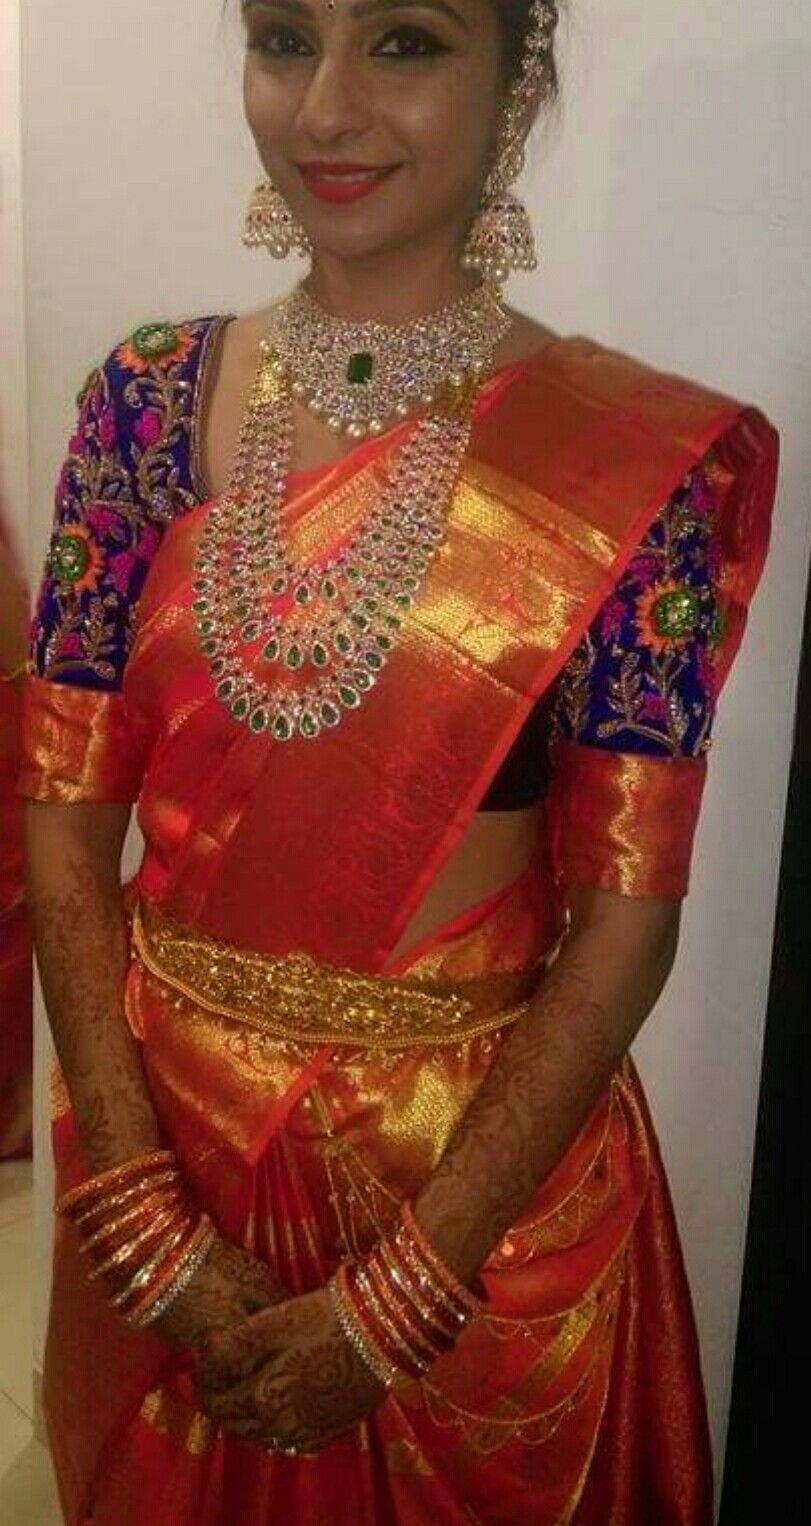 f2b52a12a343dd Glamorous South Indian Bride in a Vibrant Orange Kanjivaram Silk Saree